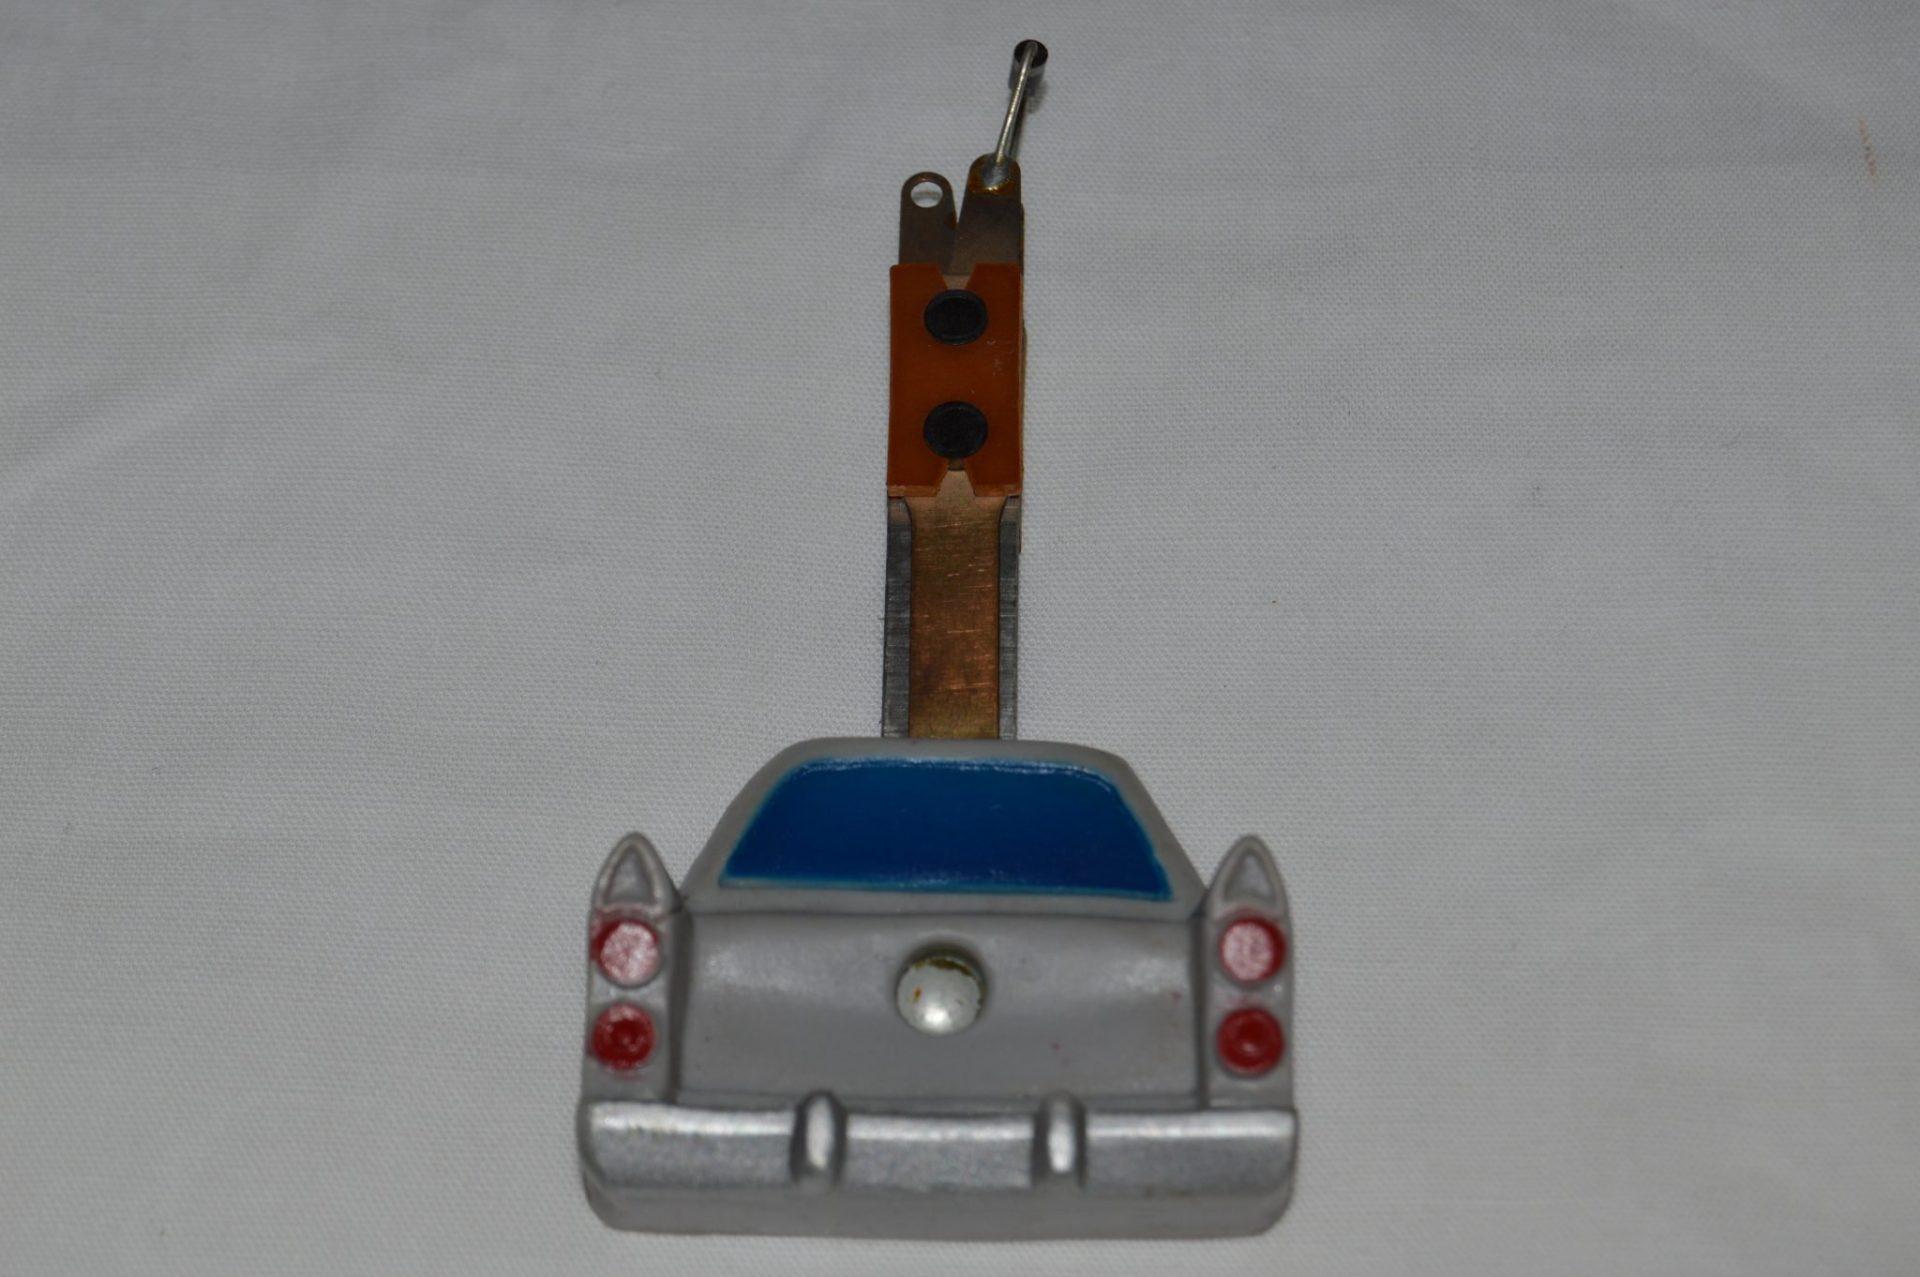 Junkyard Car Tar Switch SW 1A 210 3